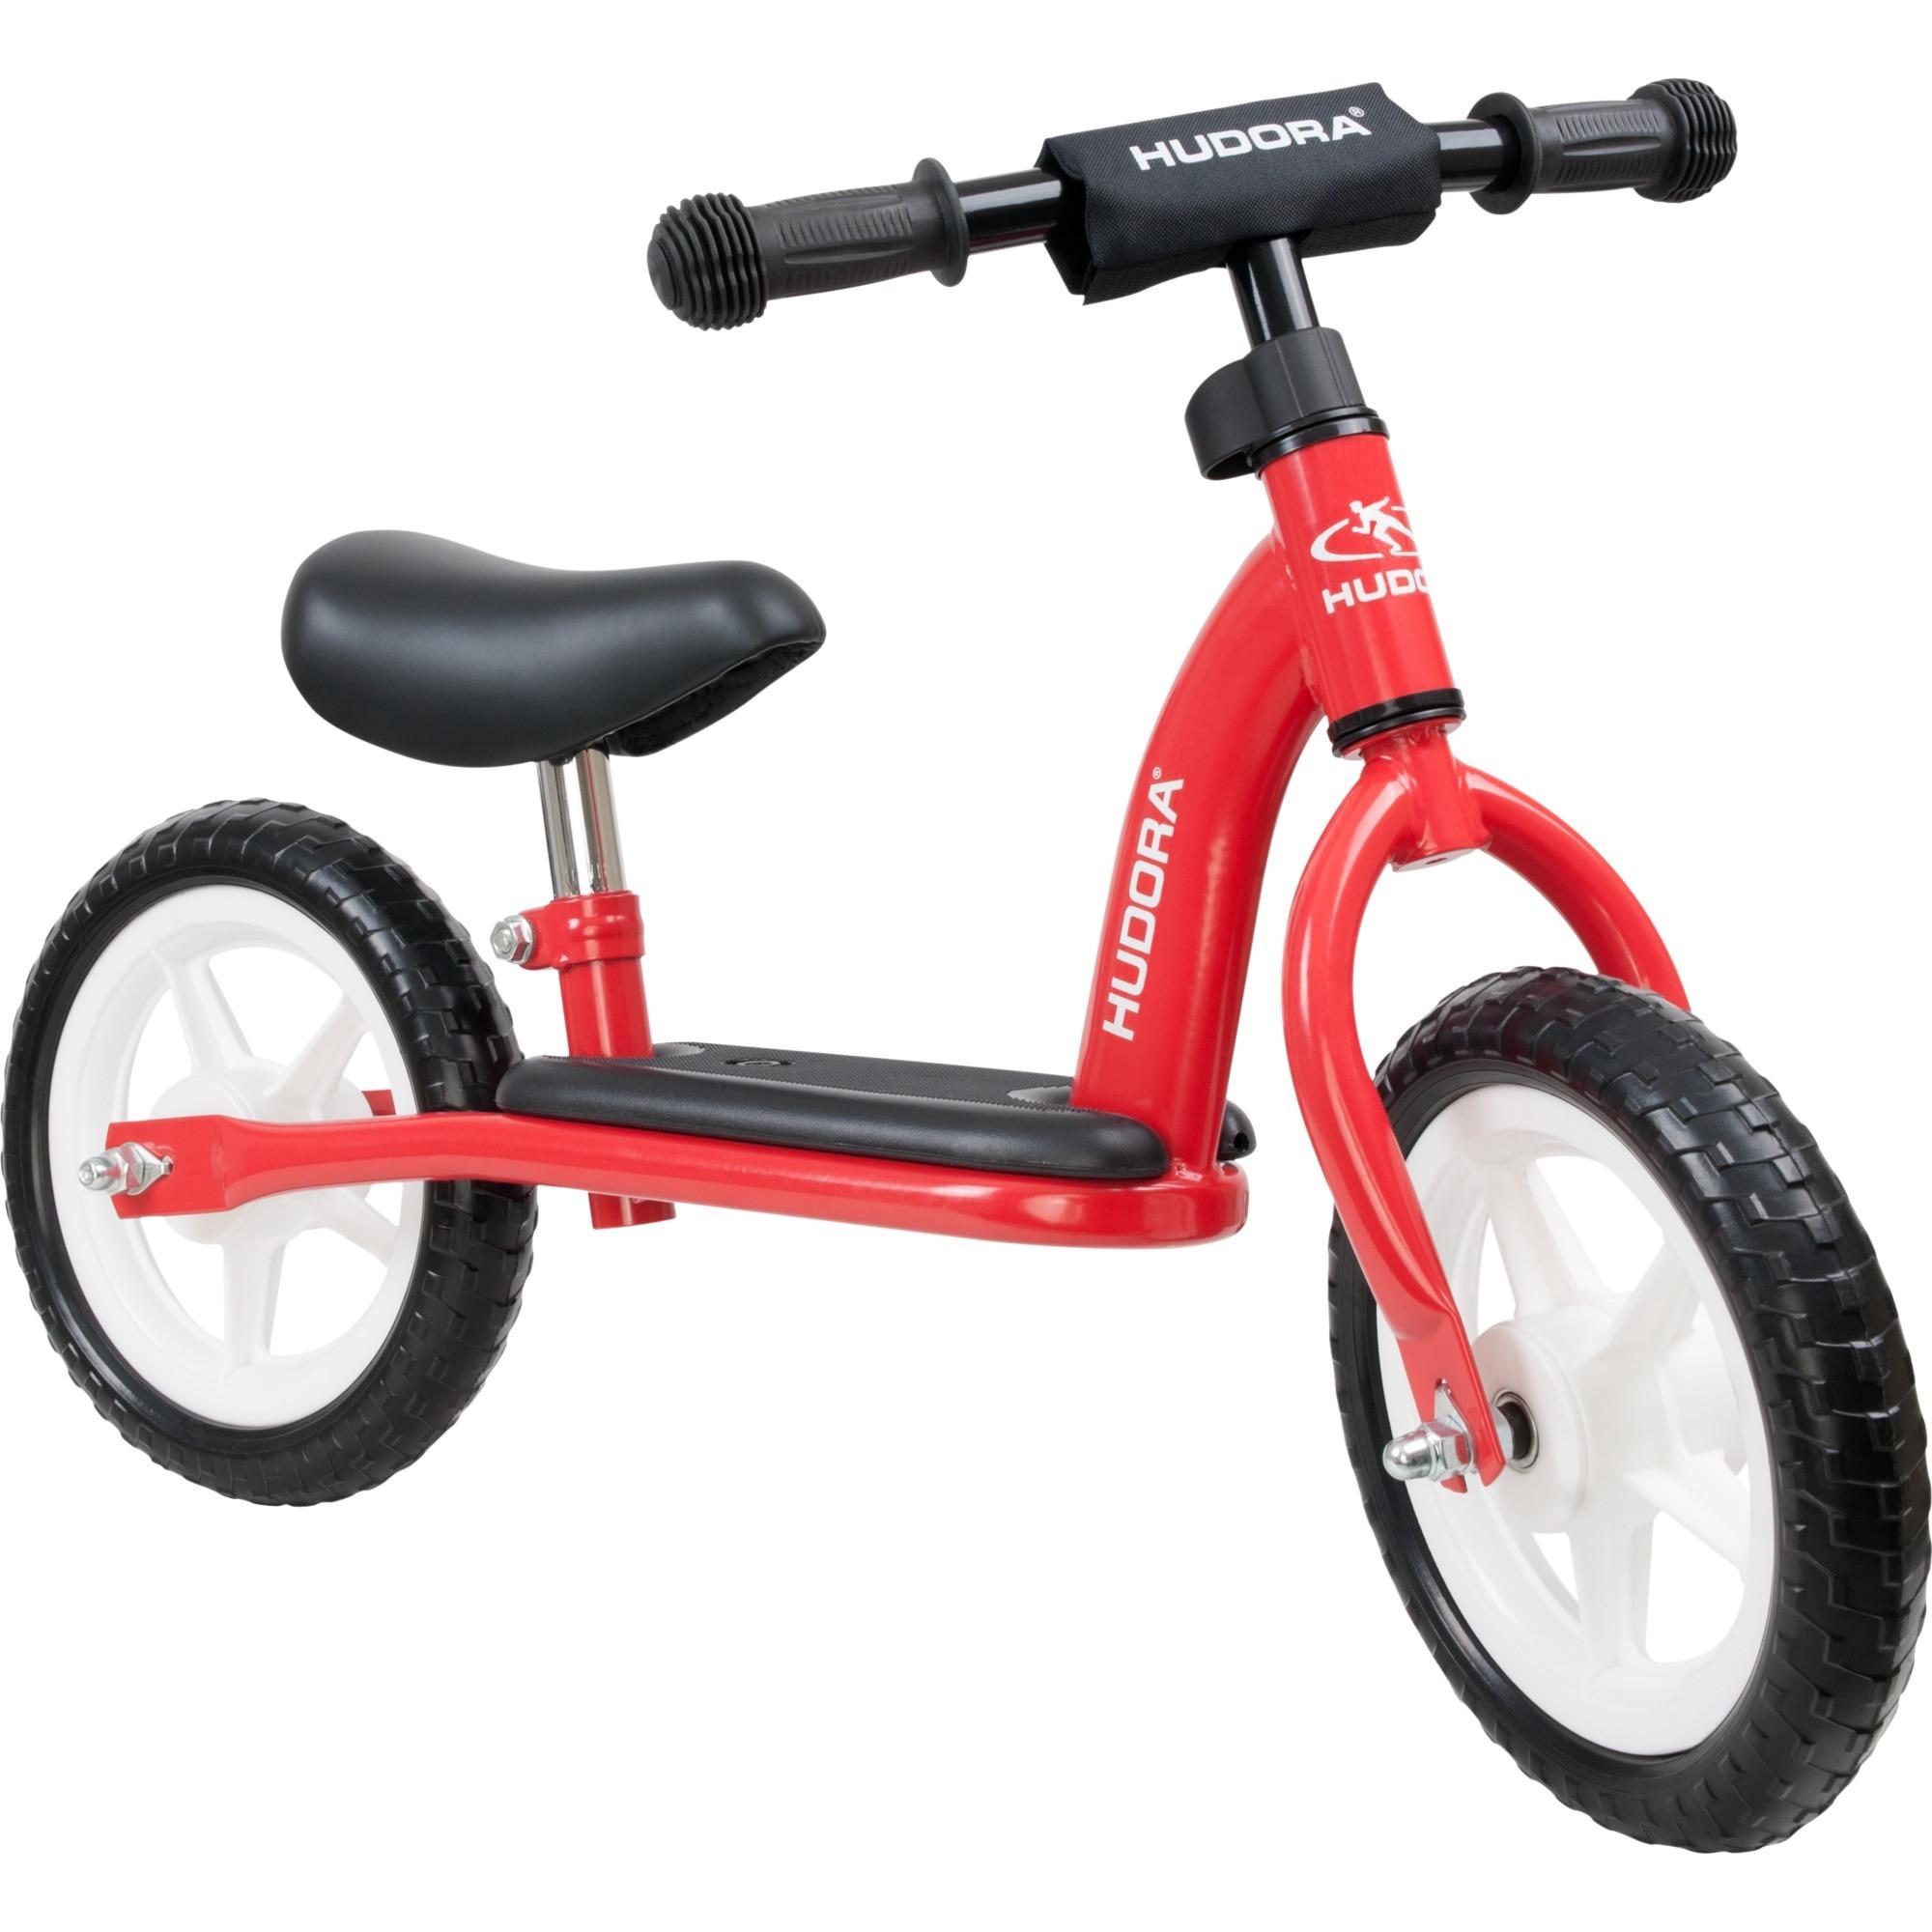 10340/01 Niños Negro, Rojo scooter, Automóvil de juguete